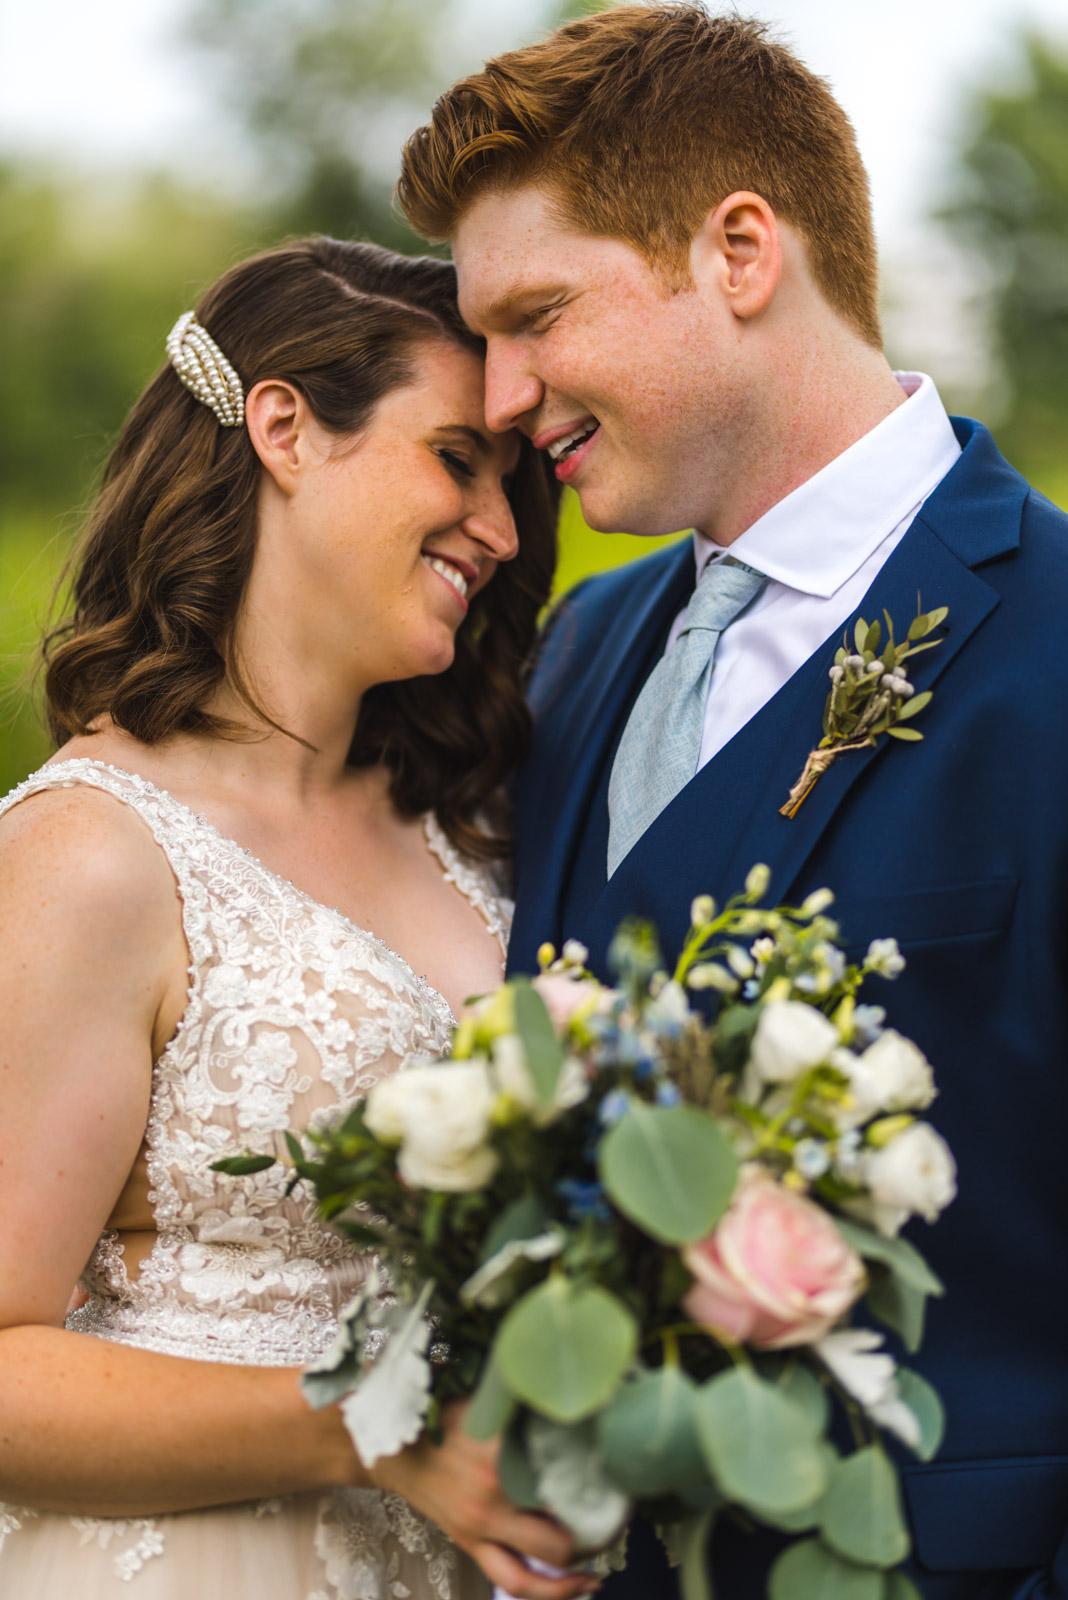 Emerson & Elicia's Golf Course Wedding Aidan & Leanne Hennebry Hamilton Wedding Videographers Photographers Niagara Hush Hush Photography & Film-48.jpg